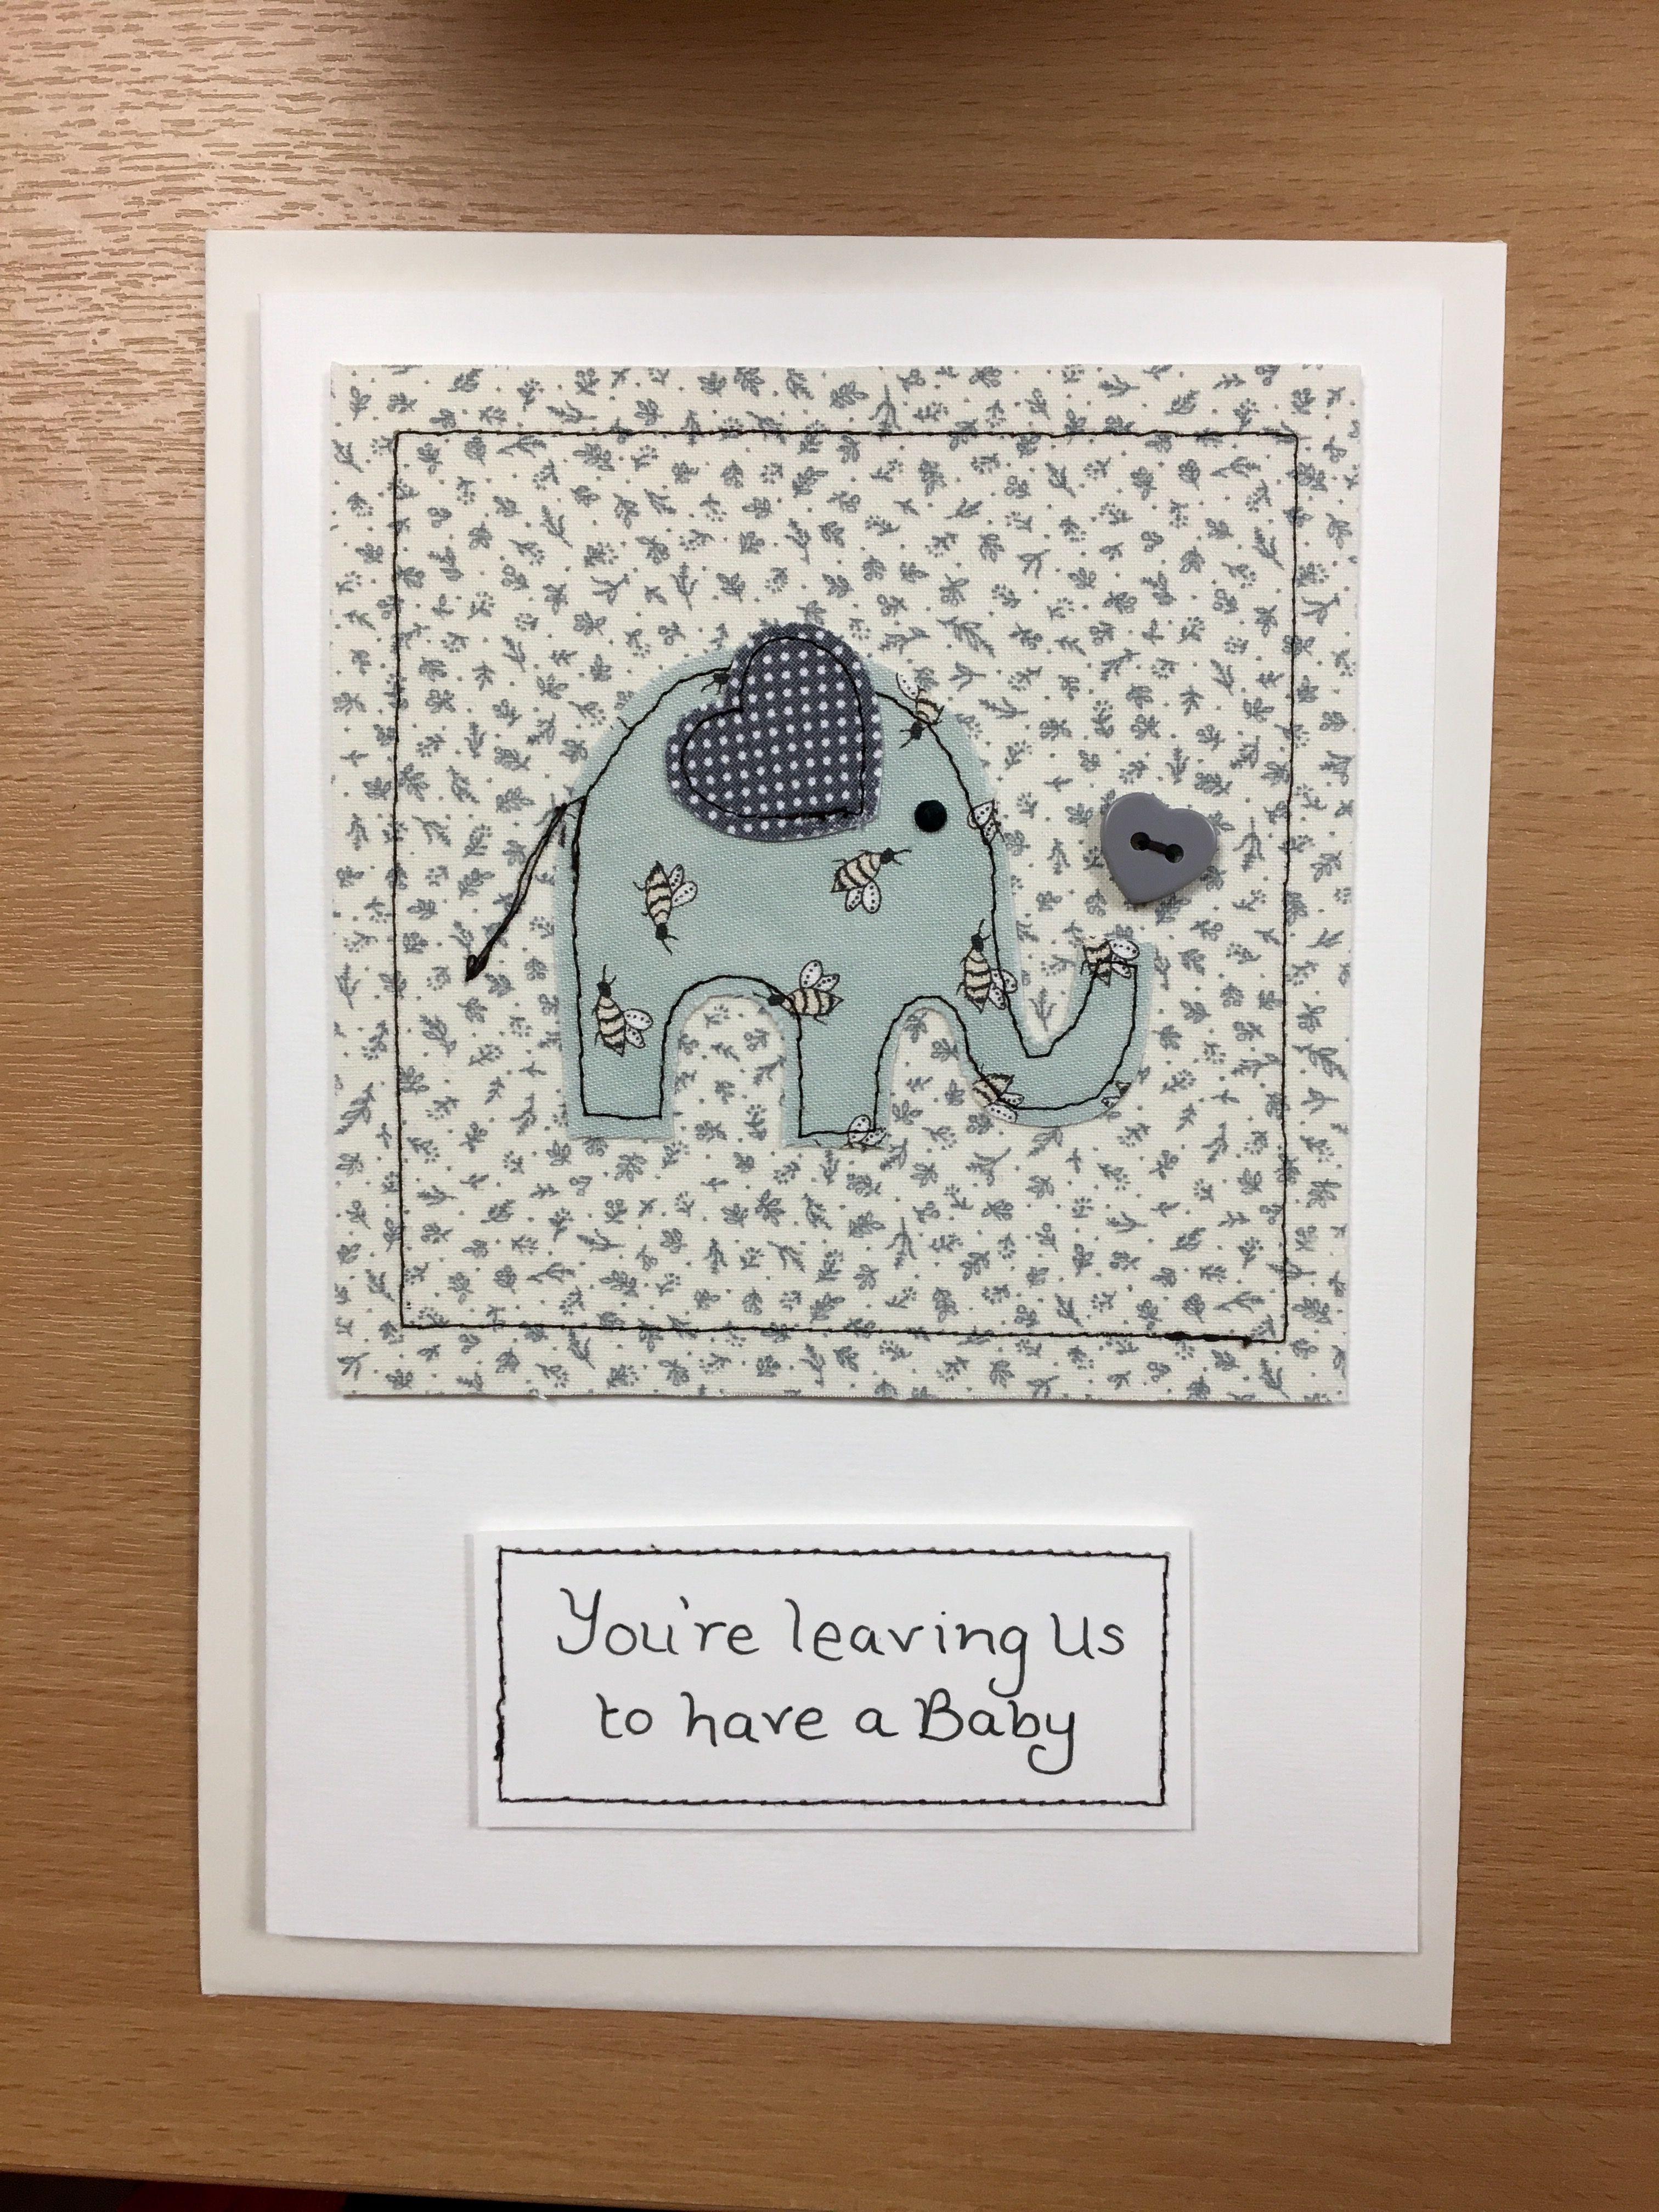 Hand made machine sewn elephant card made with pretty fabrics and